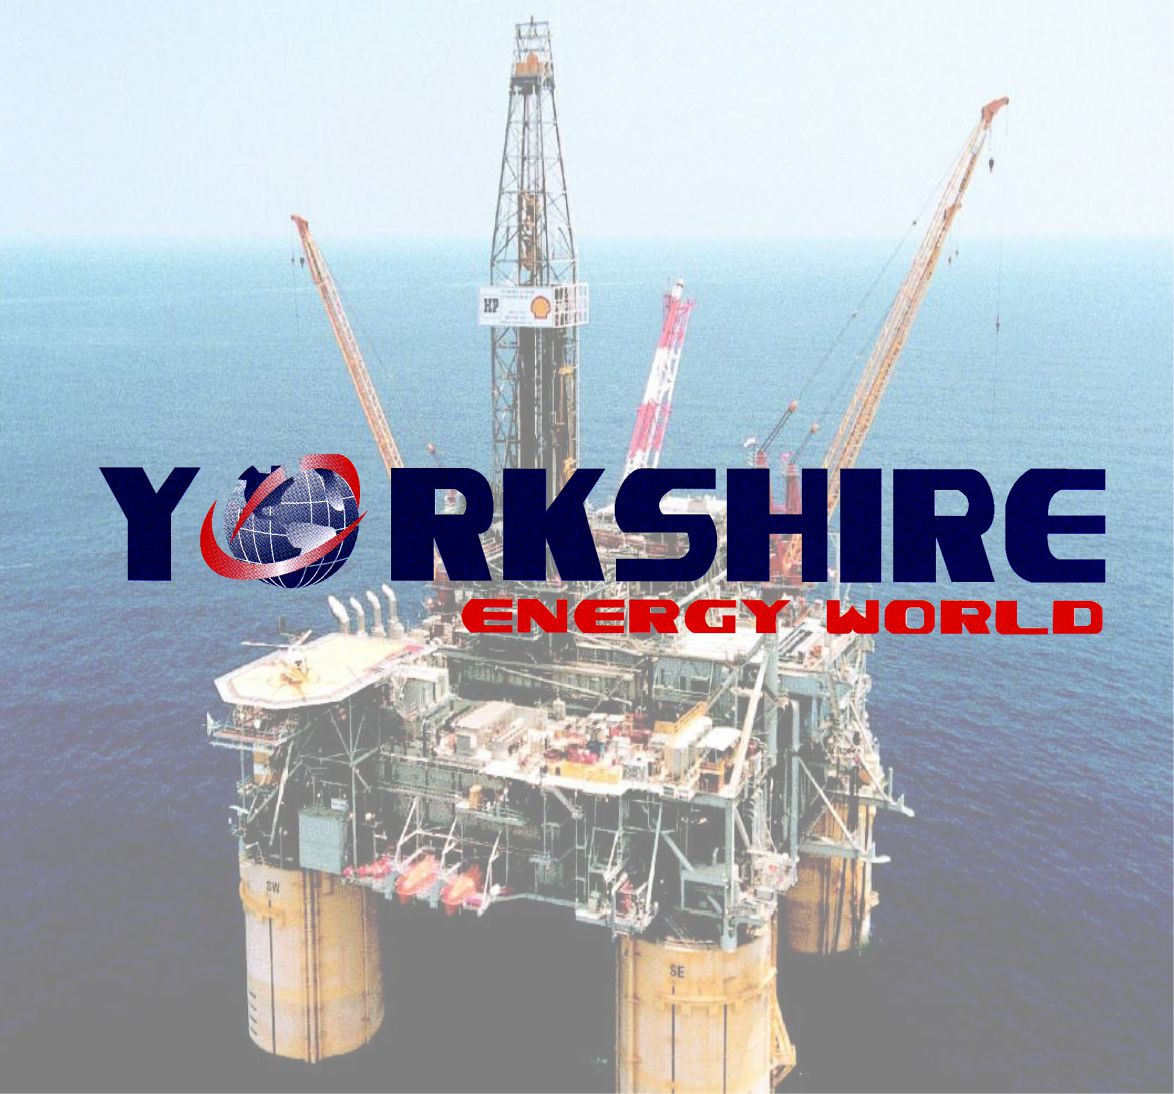 Yorkshire Energy World